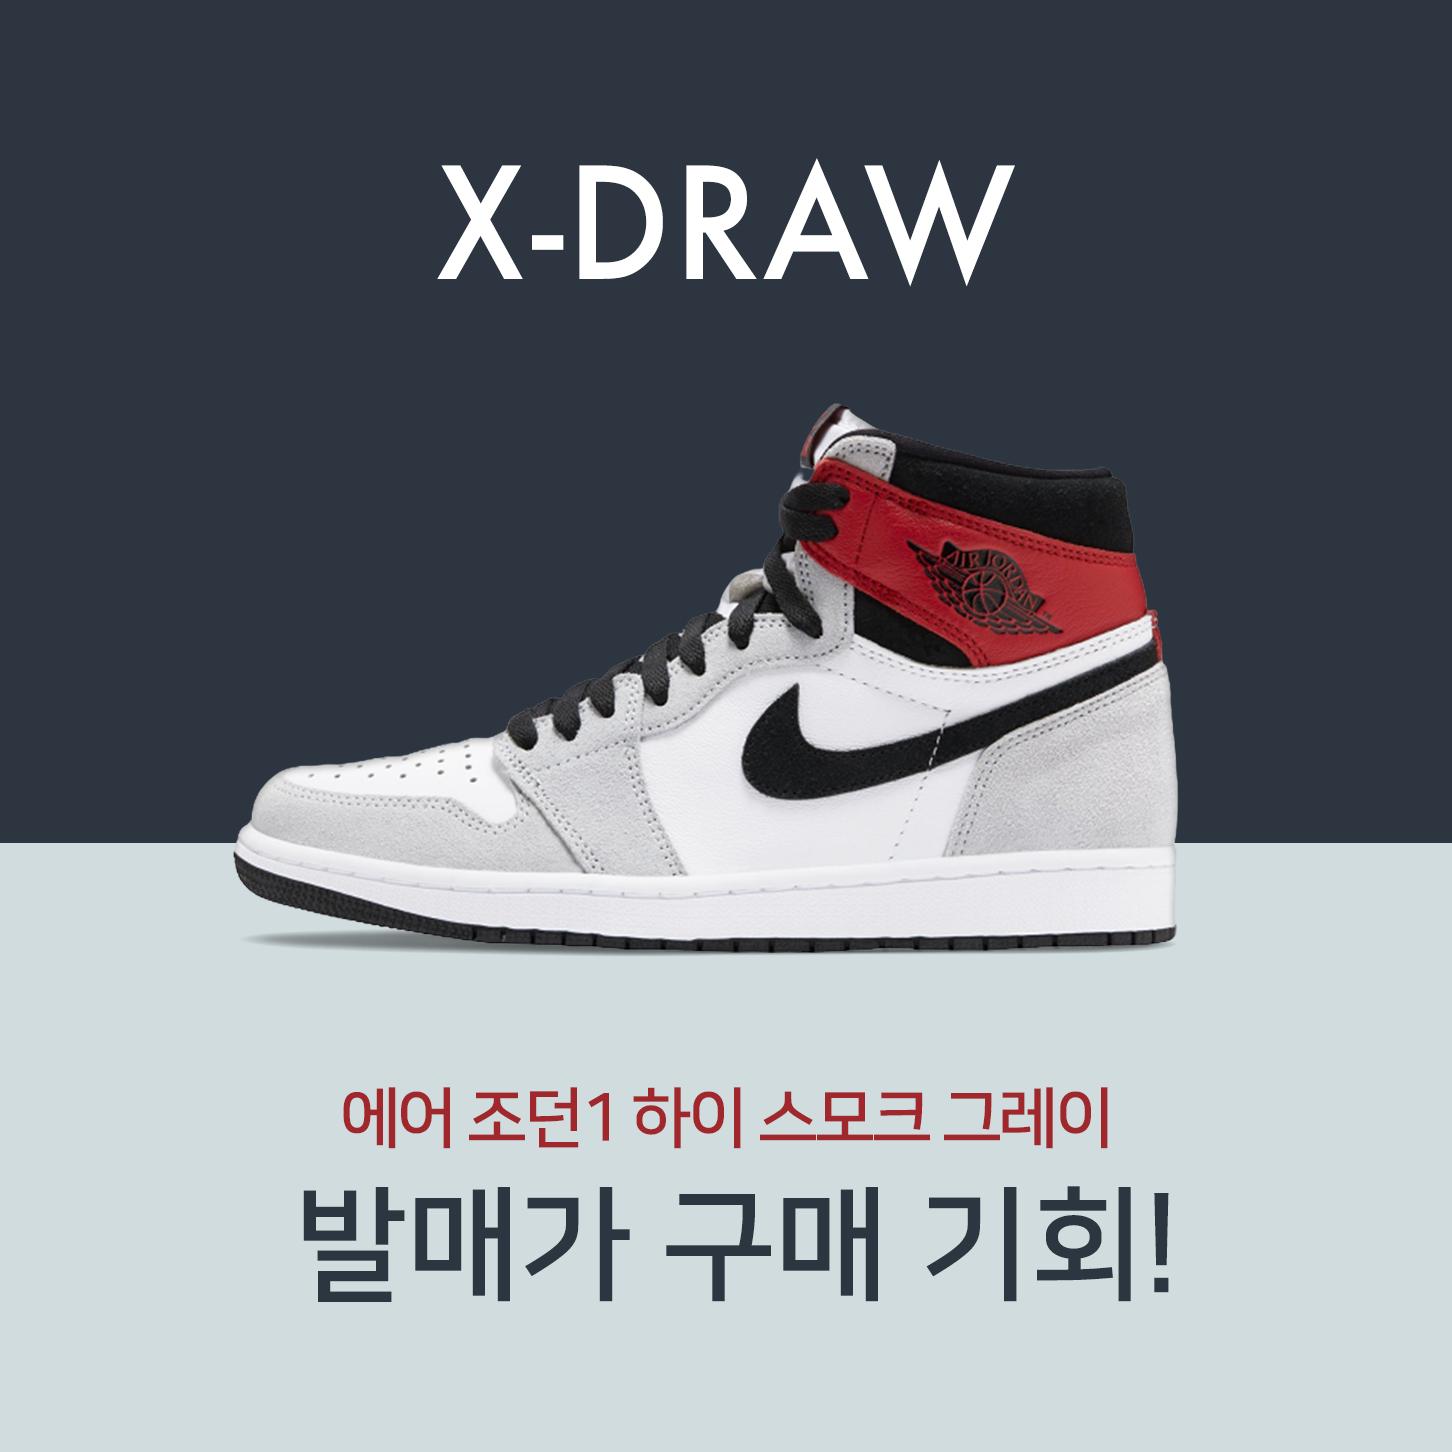 X- DRAW : Jordan 1 Retro High Smoke Grey